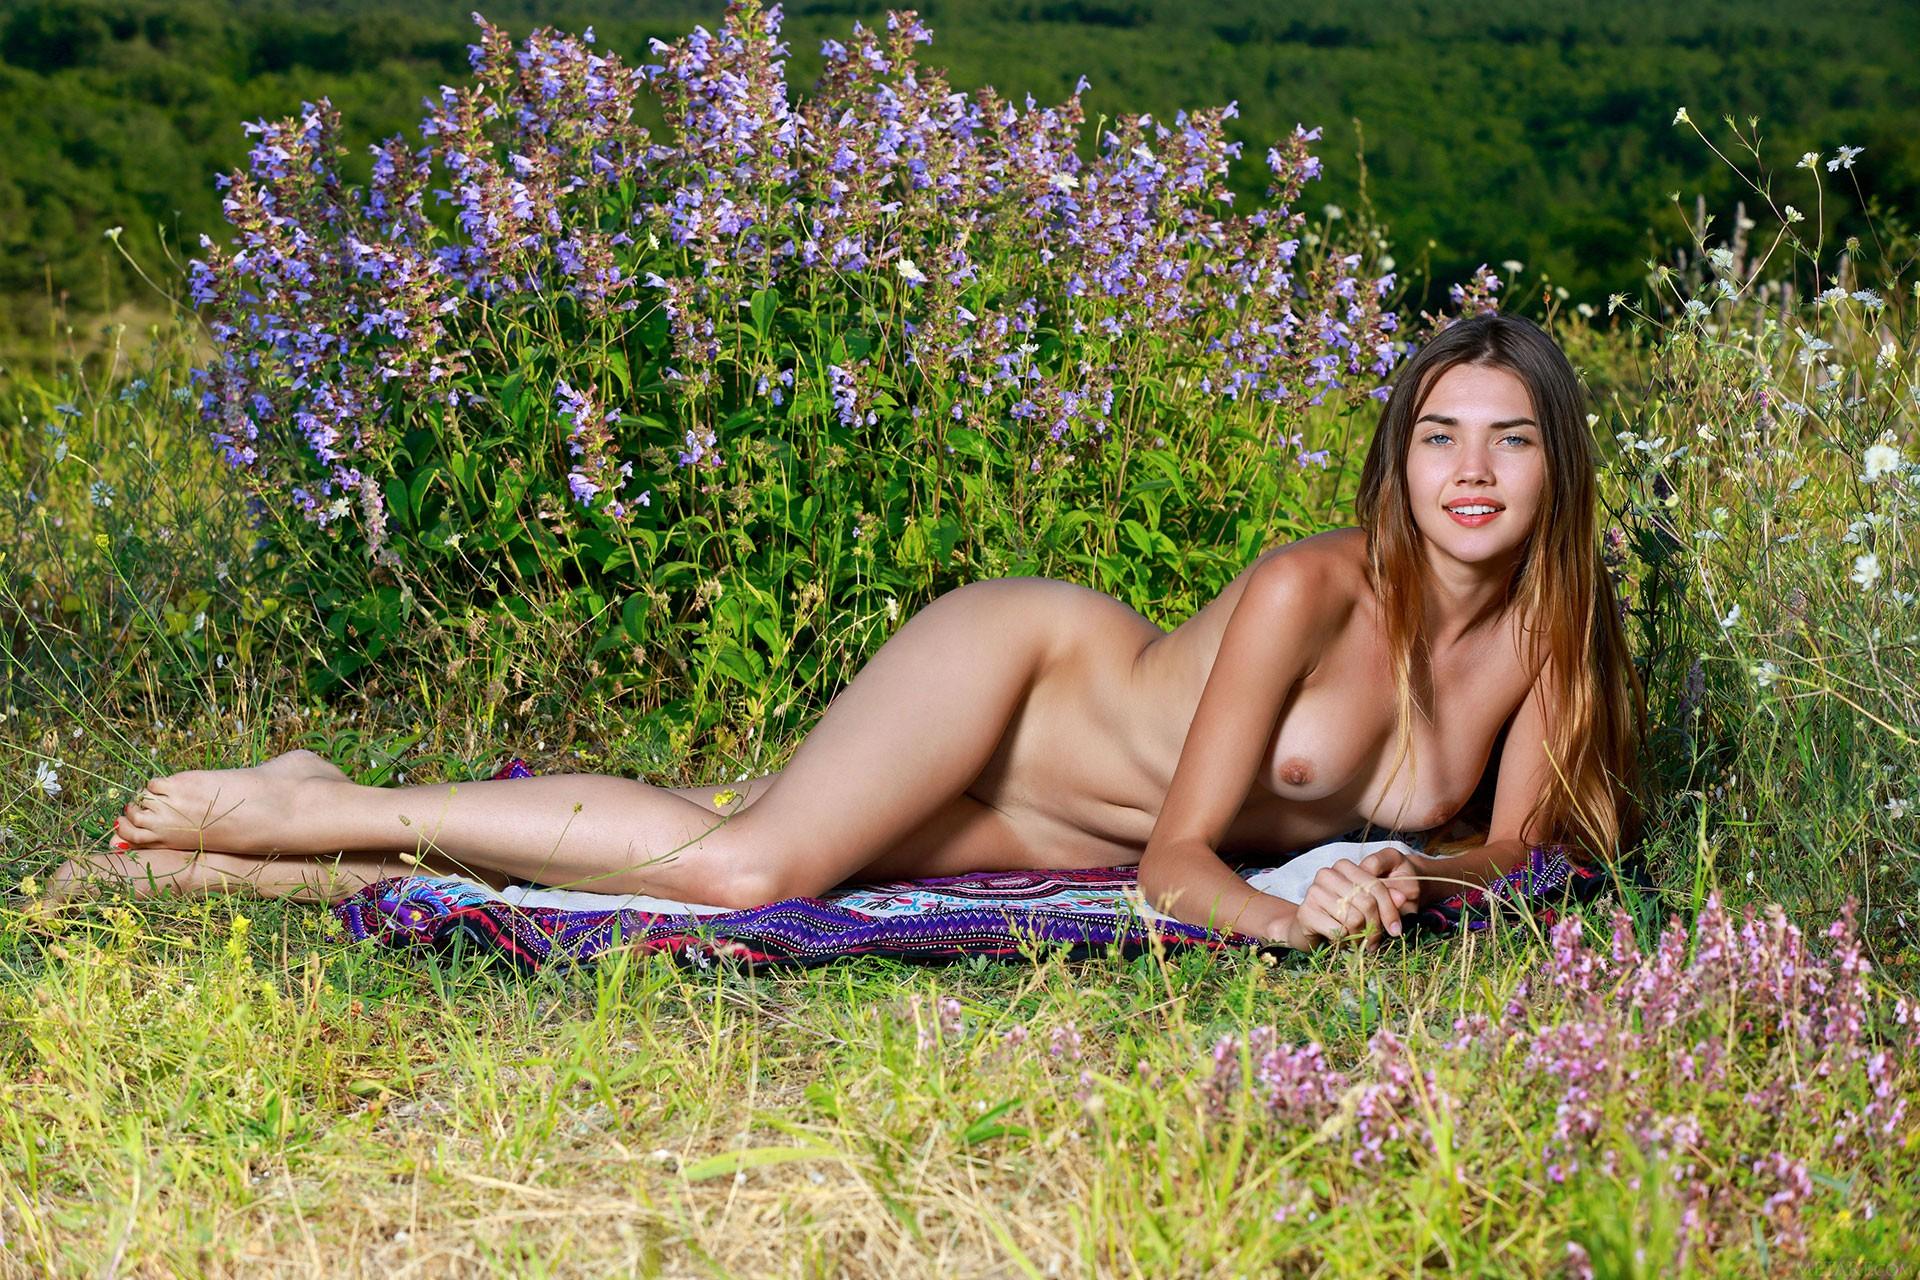 Georgia girls homemade pics on nude amateur sex naked